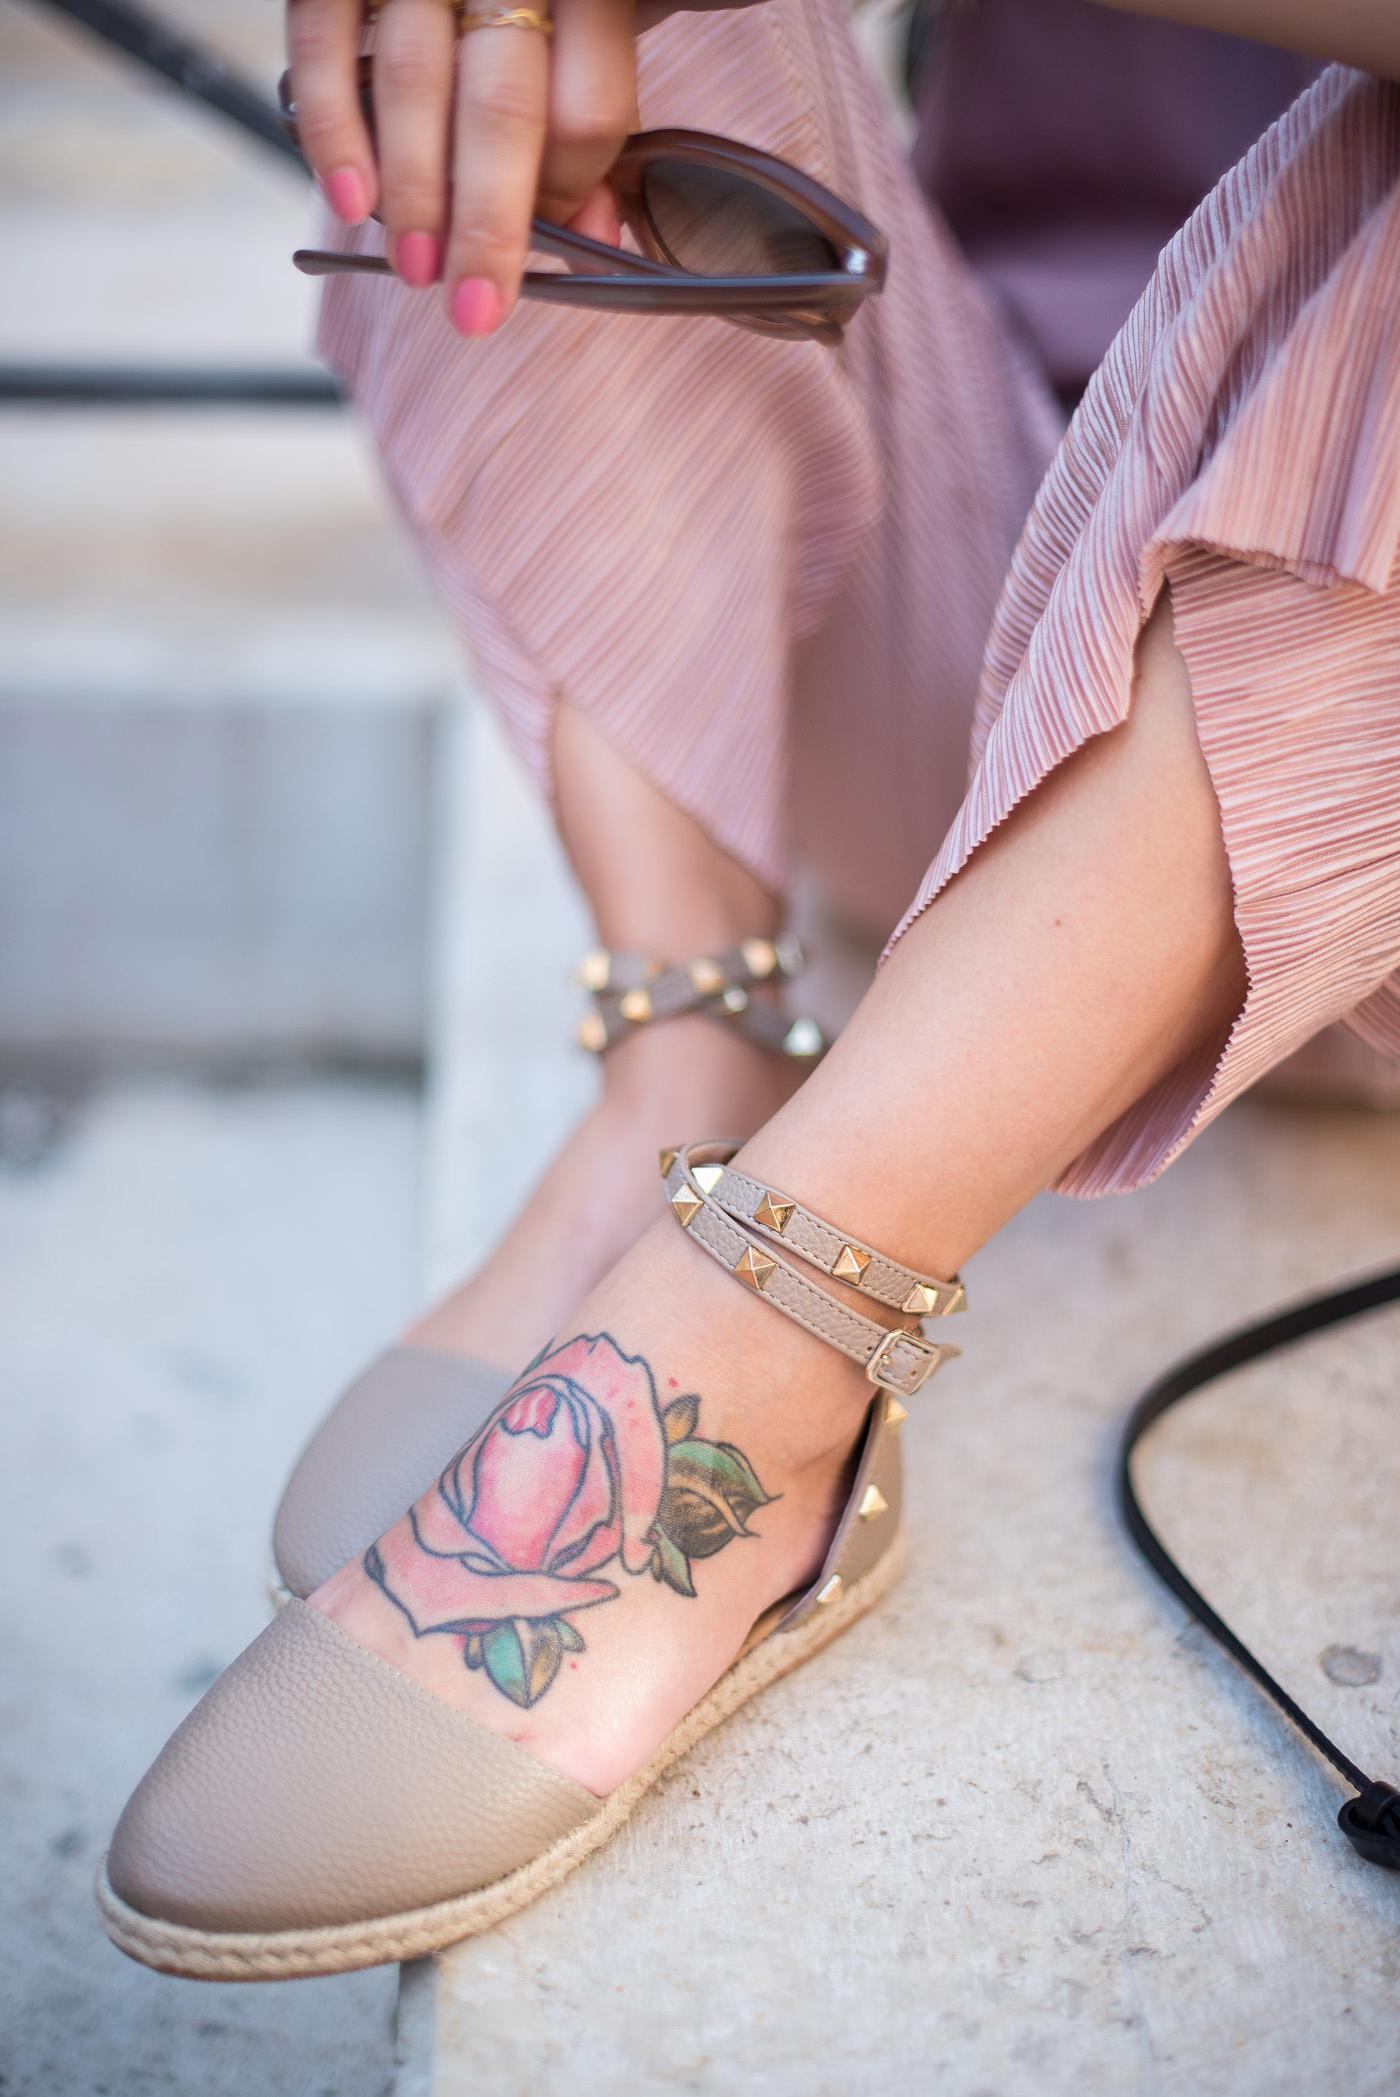 Candy_colors_culotte_outfit_in_Venezia_5